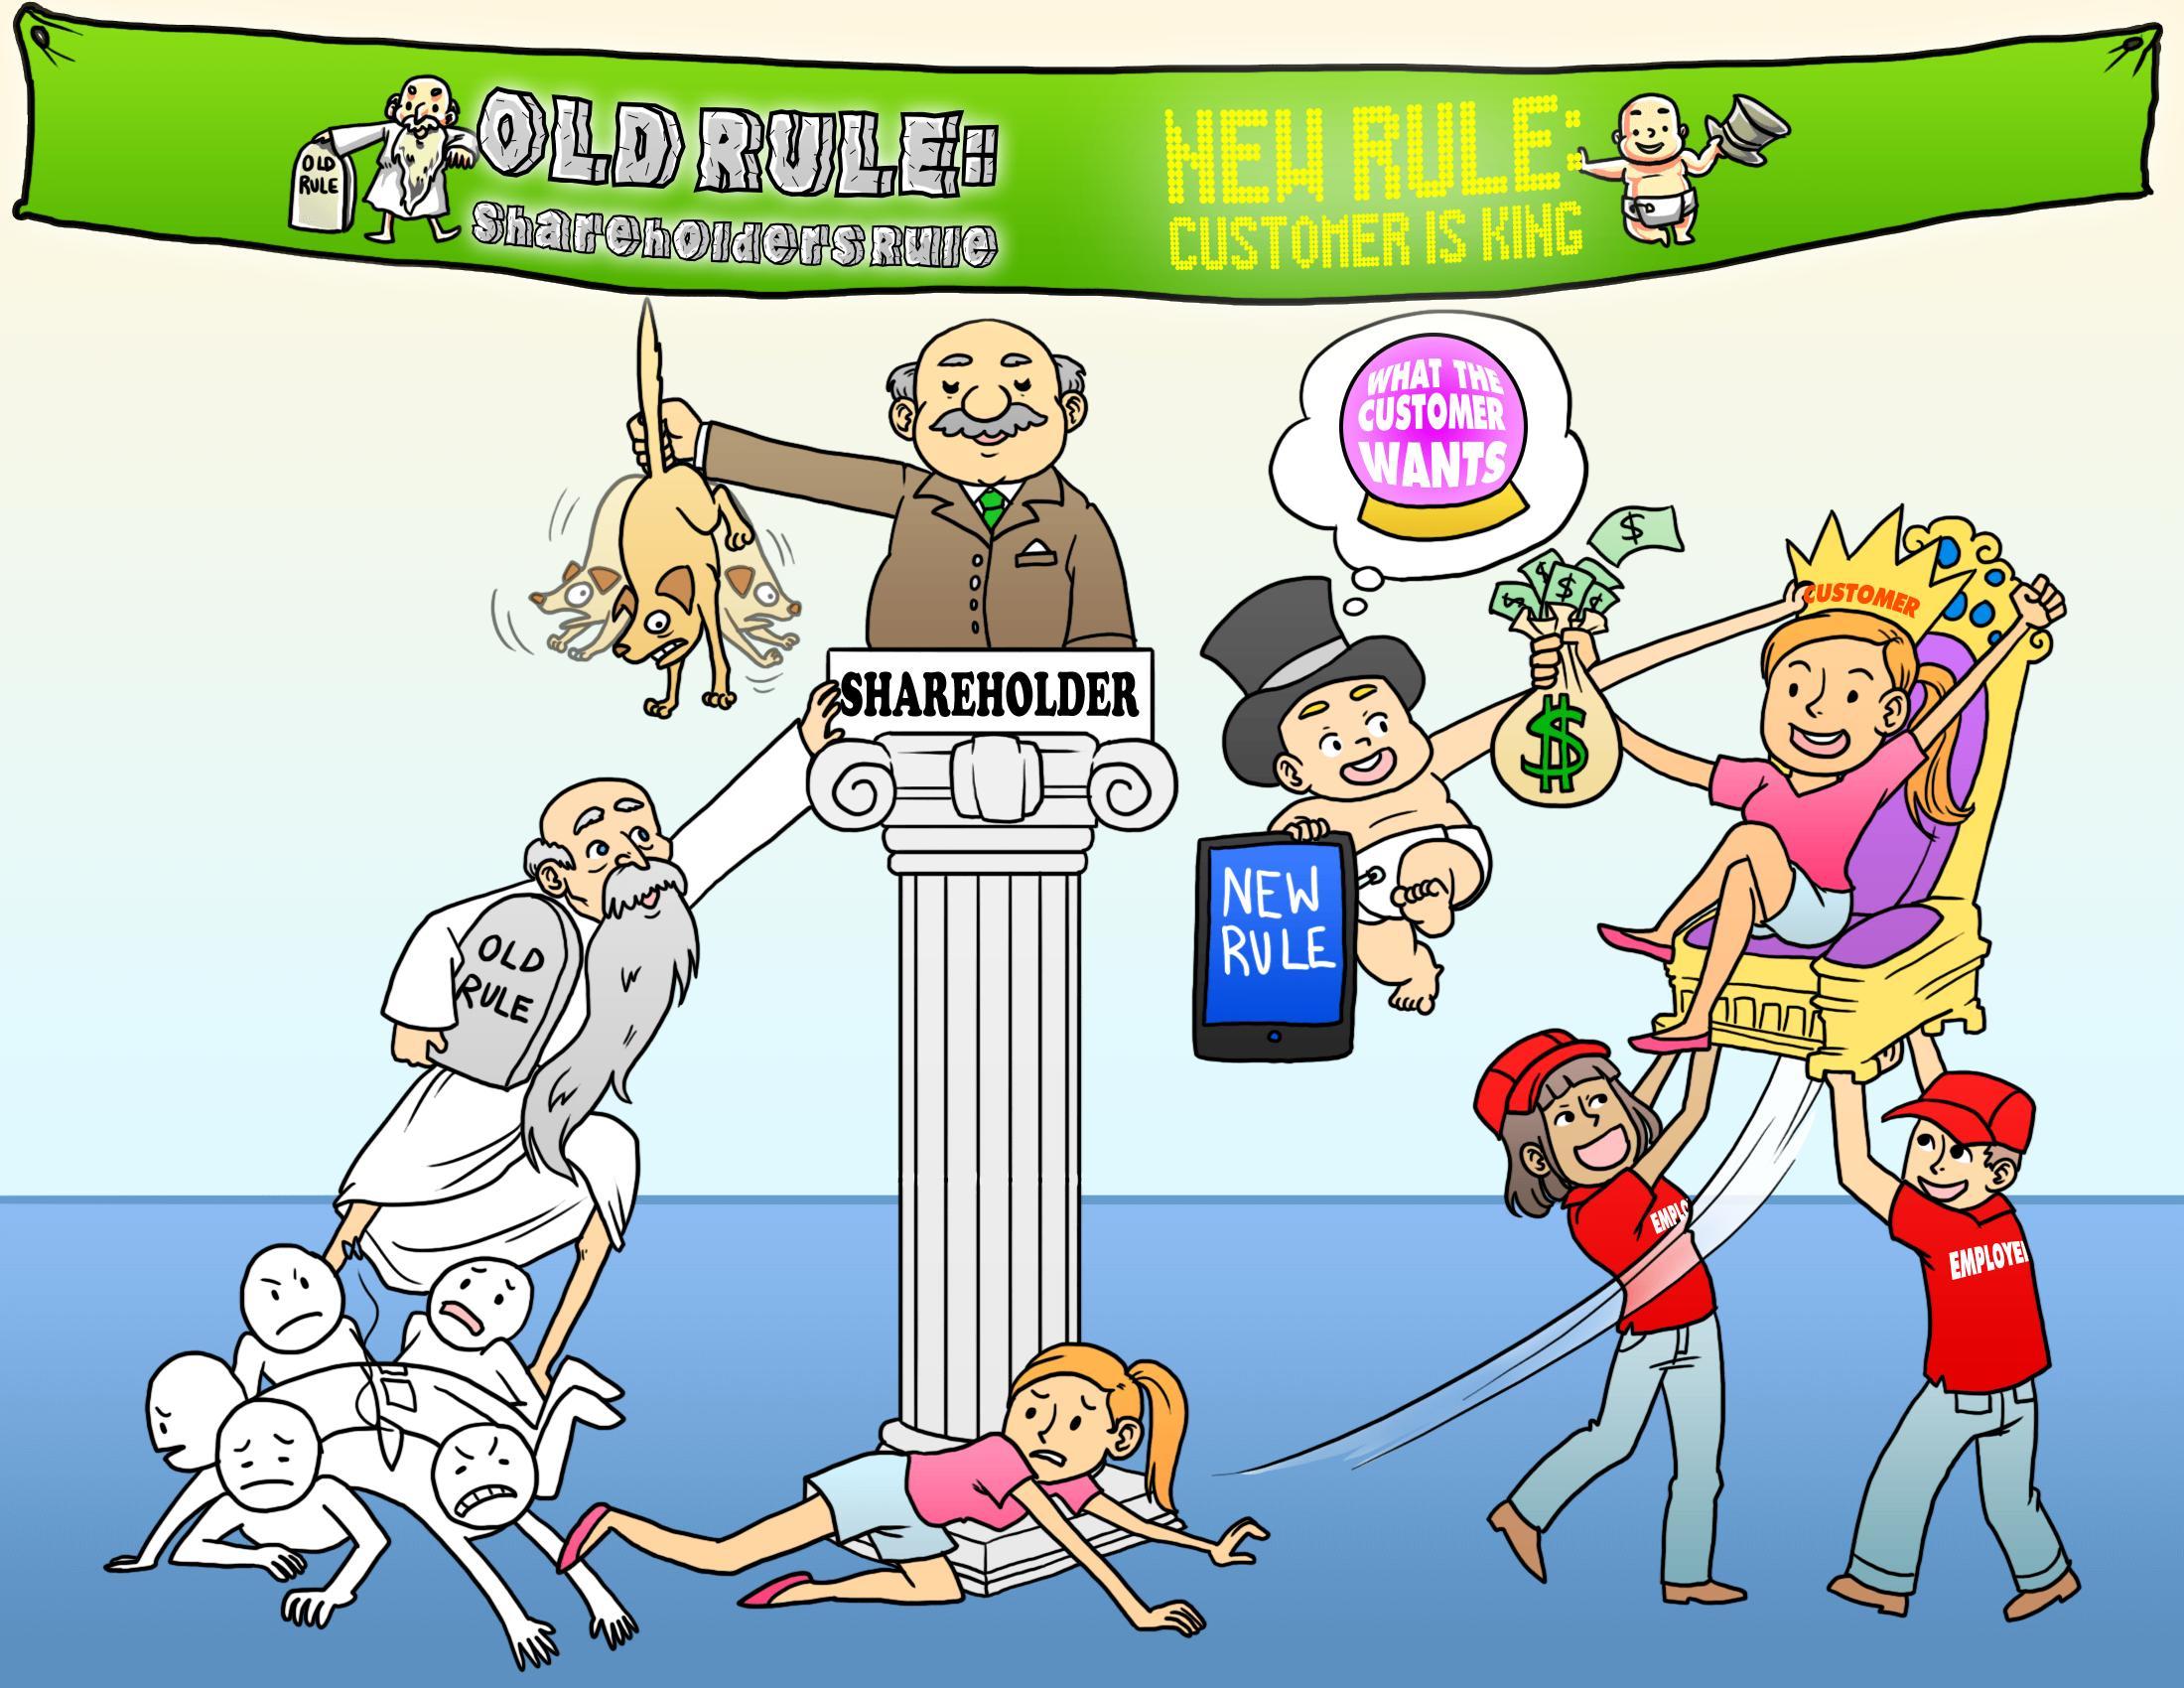 Old Rule: Shareholders Rule / New Rule: The Customer is King